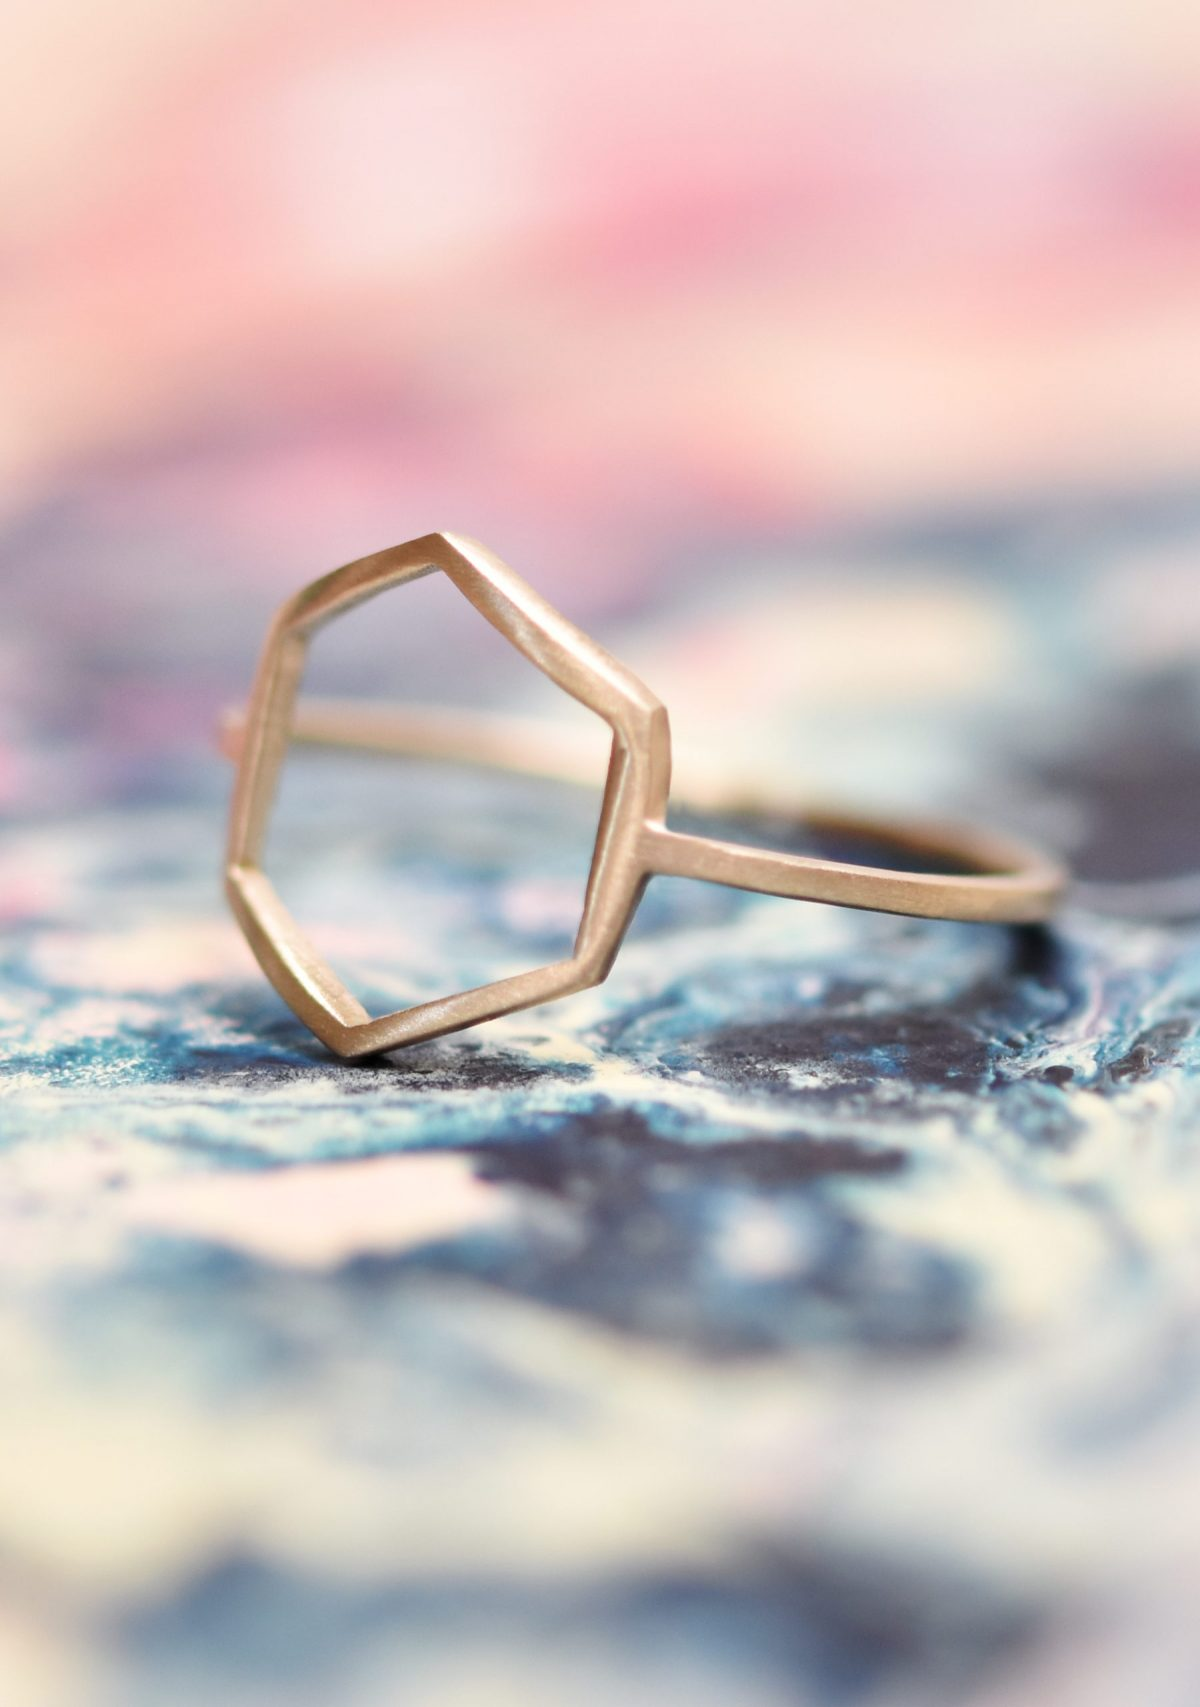 Hexagon Geometric 10k Gold Ring